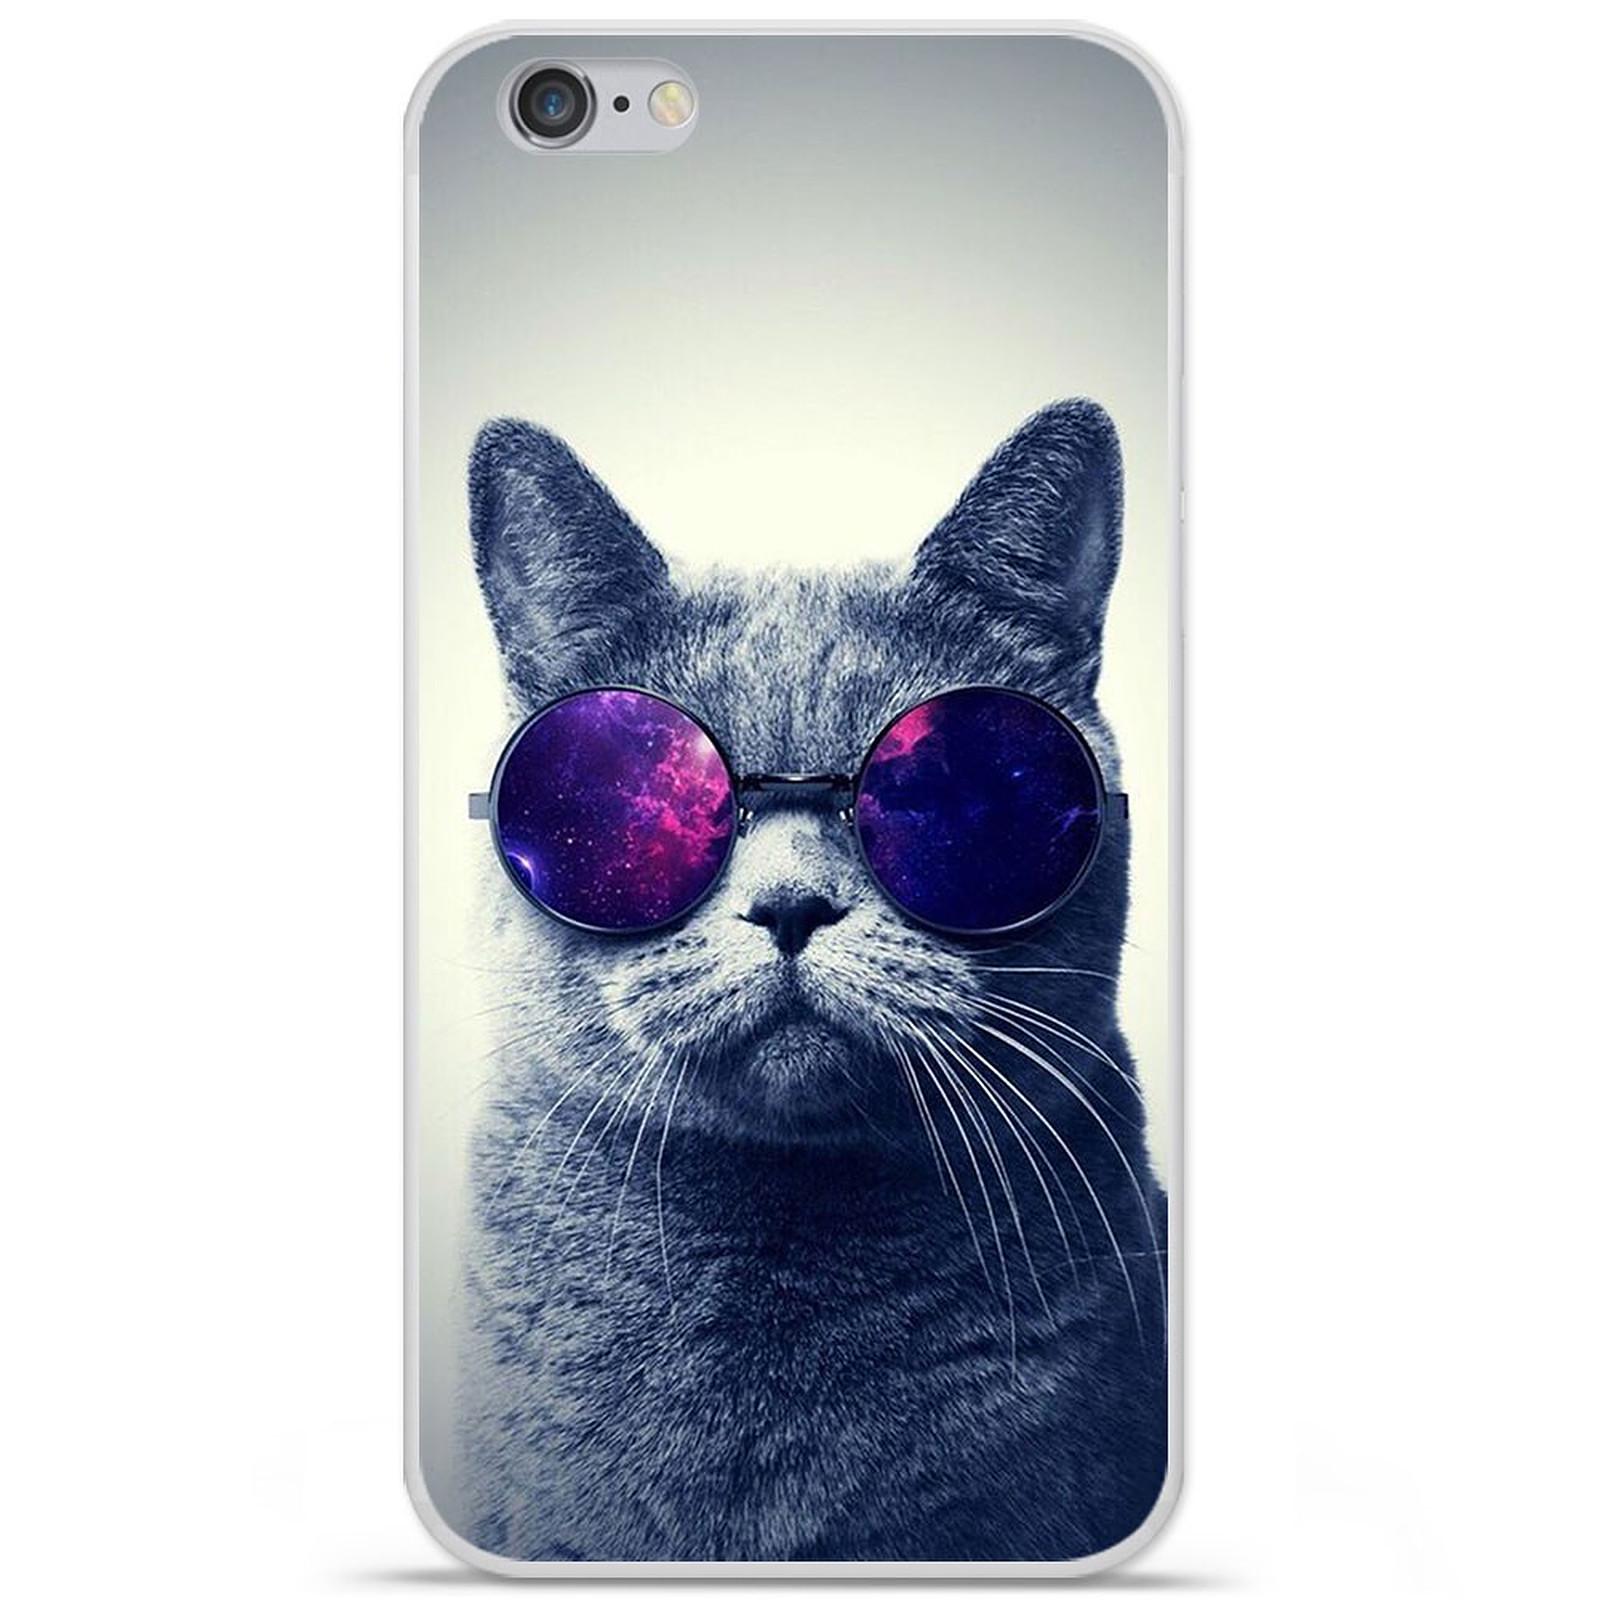 1001 Coques Coque silicone gel Apple IPhone 7 Plus motif Chat à lunette